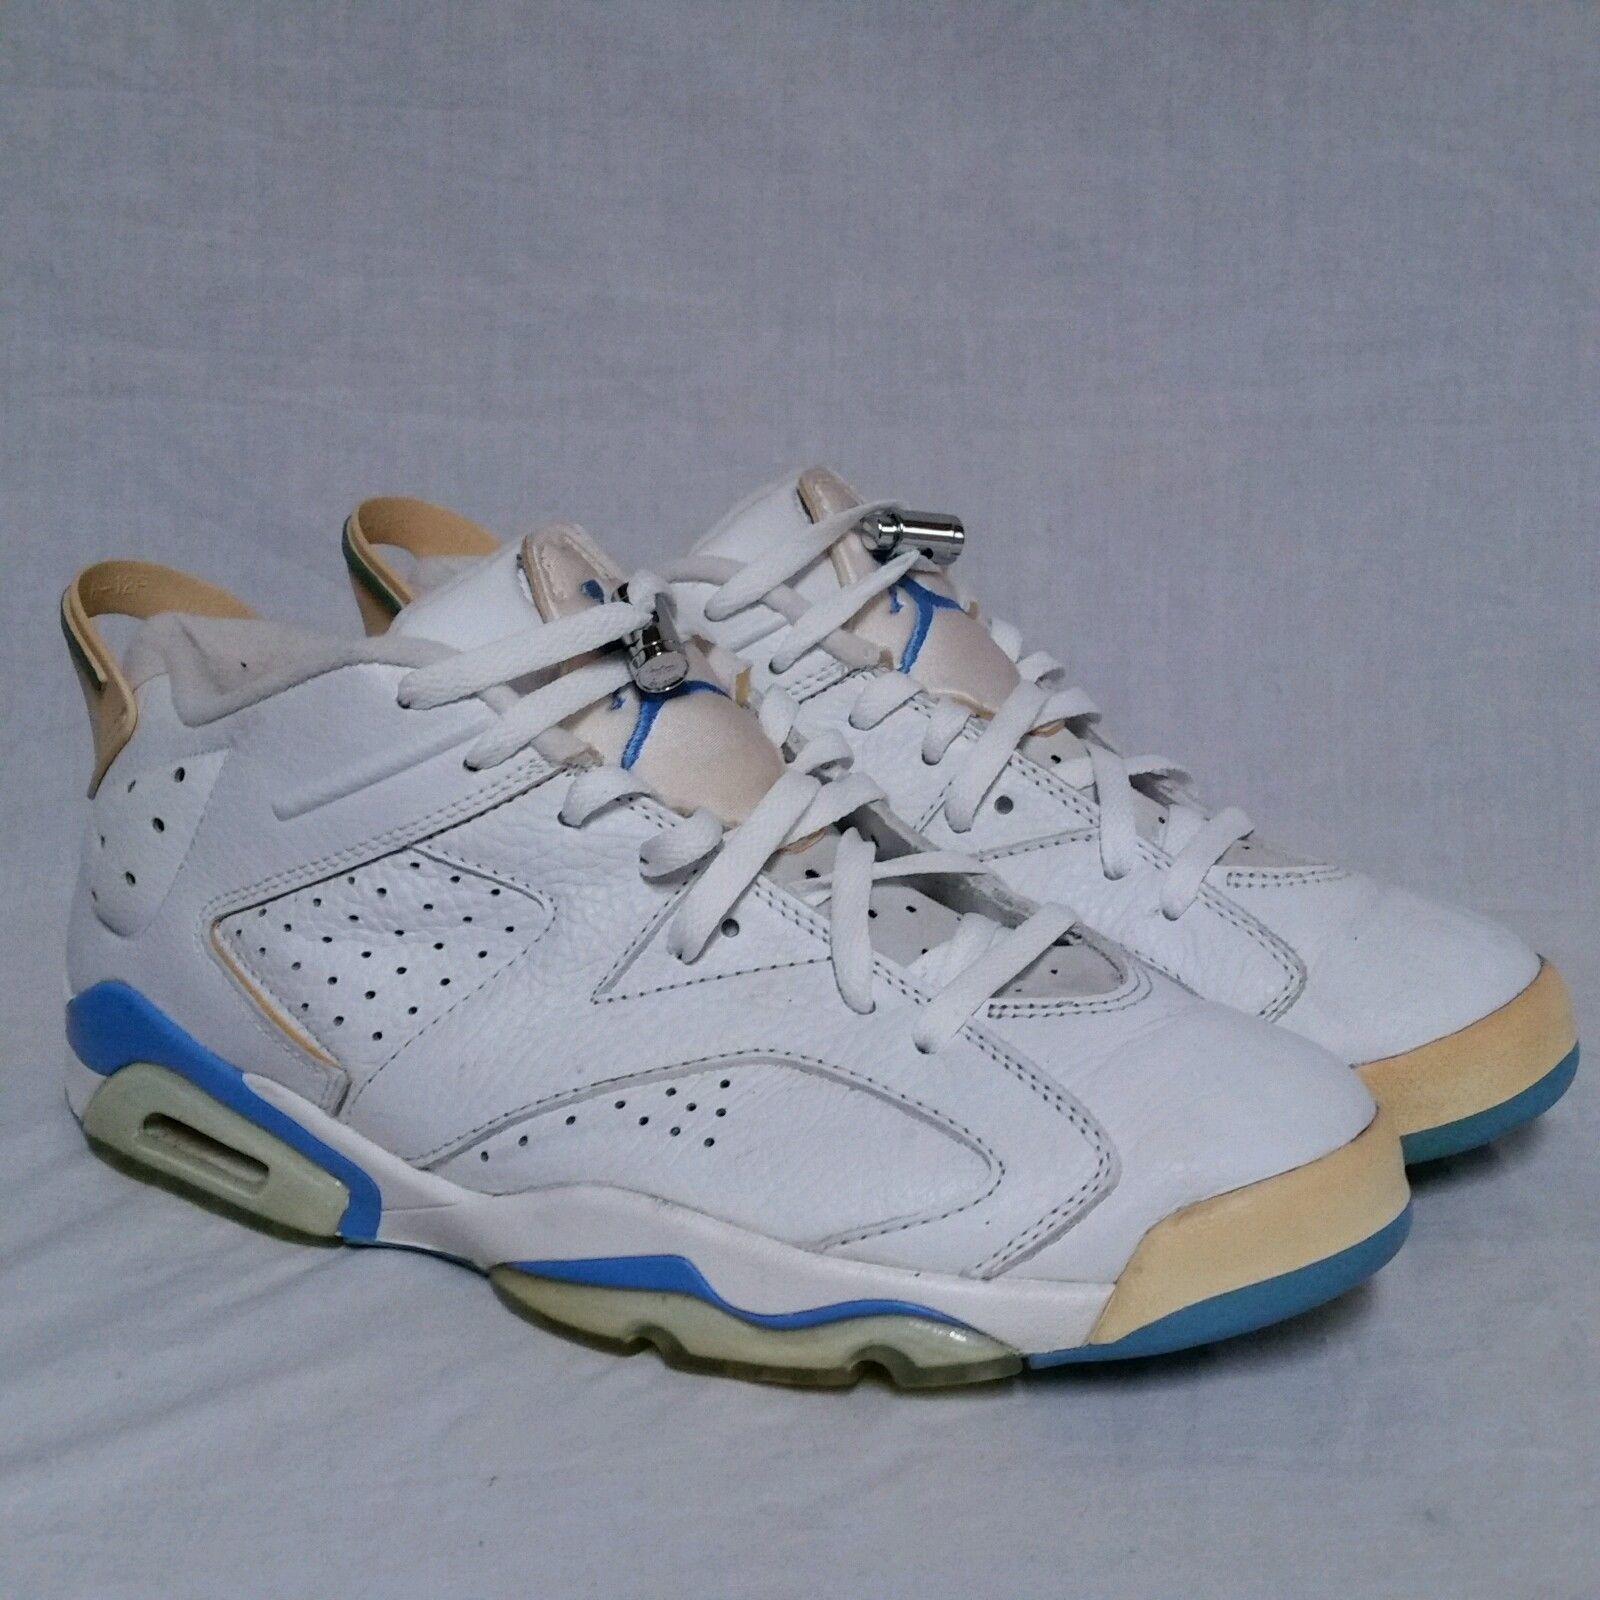 354d154429cf S l1600. S l1600. Previous. Nike Air Jordan Retro 6 vi Low Carolina UNC  University Infrared Chrome Mens 12